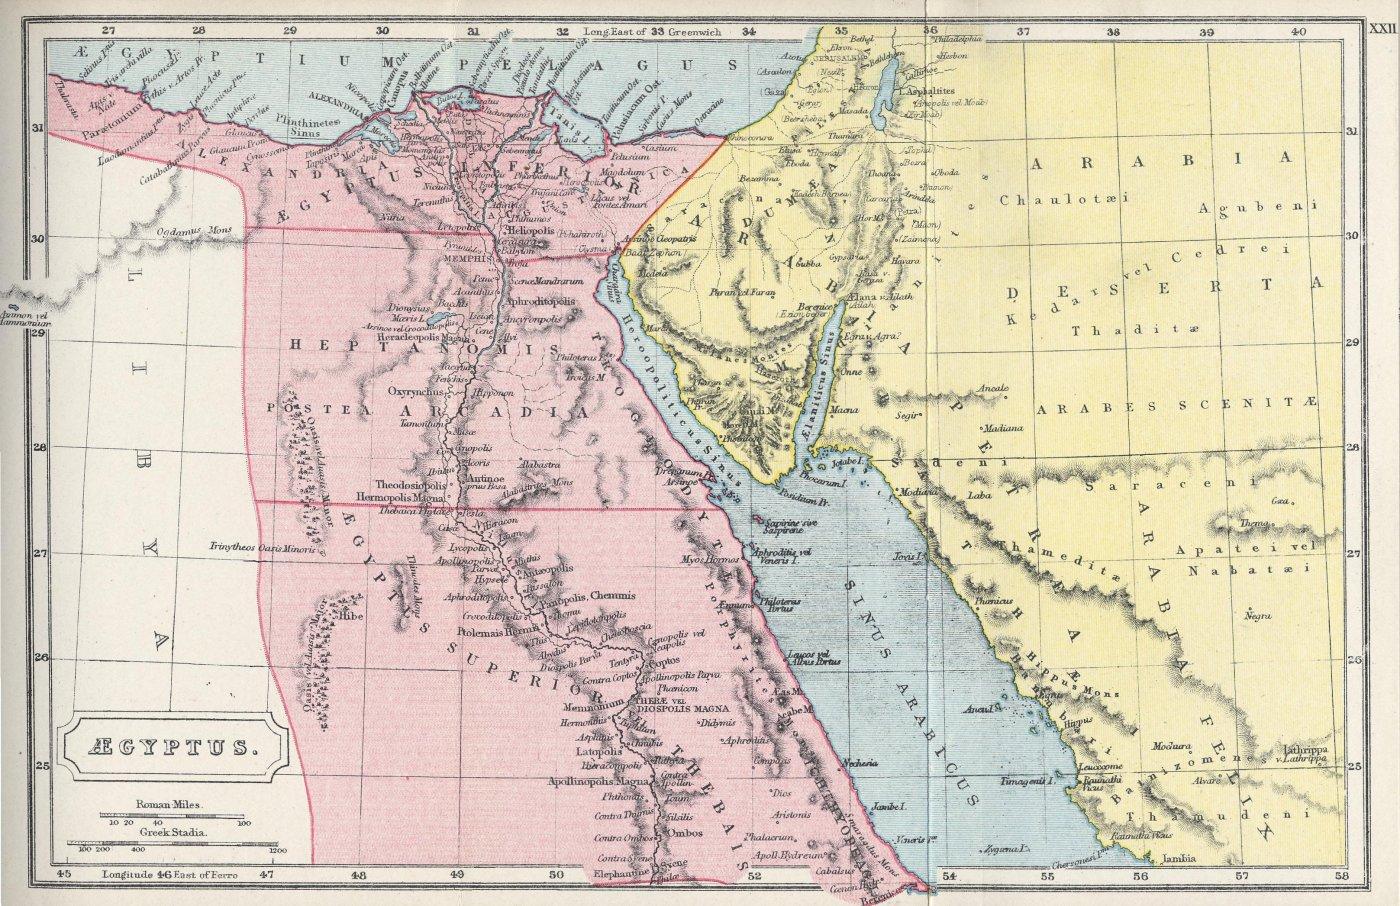 Map of Aegyptus